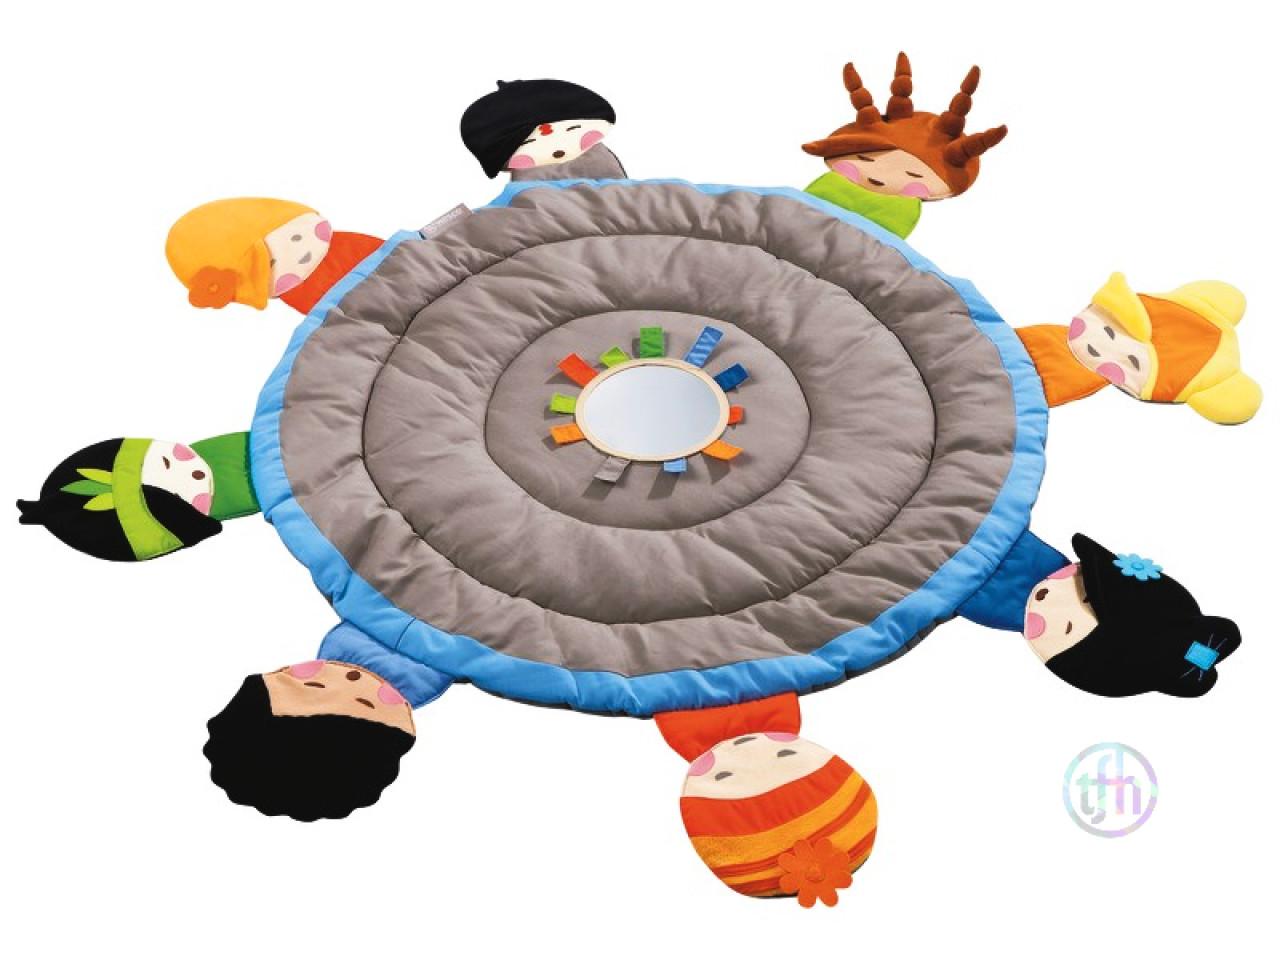 Global Children Tactile Playmat